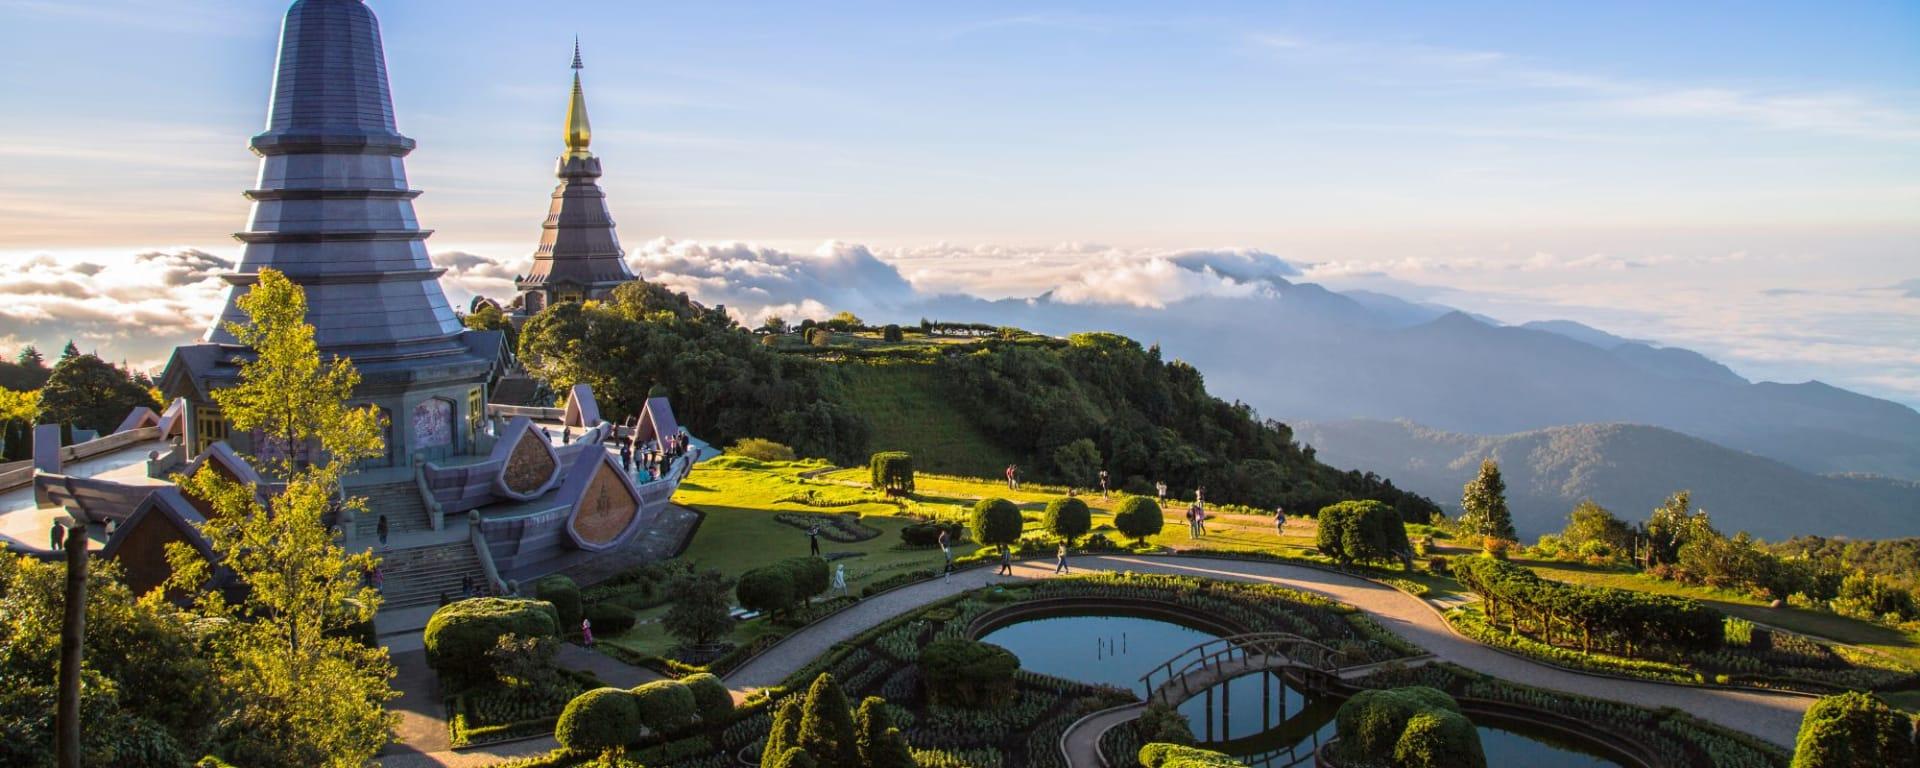 Mietwagenrundreise Mae Hong Son ab Chiang Mai: Doi Inthanon temple